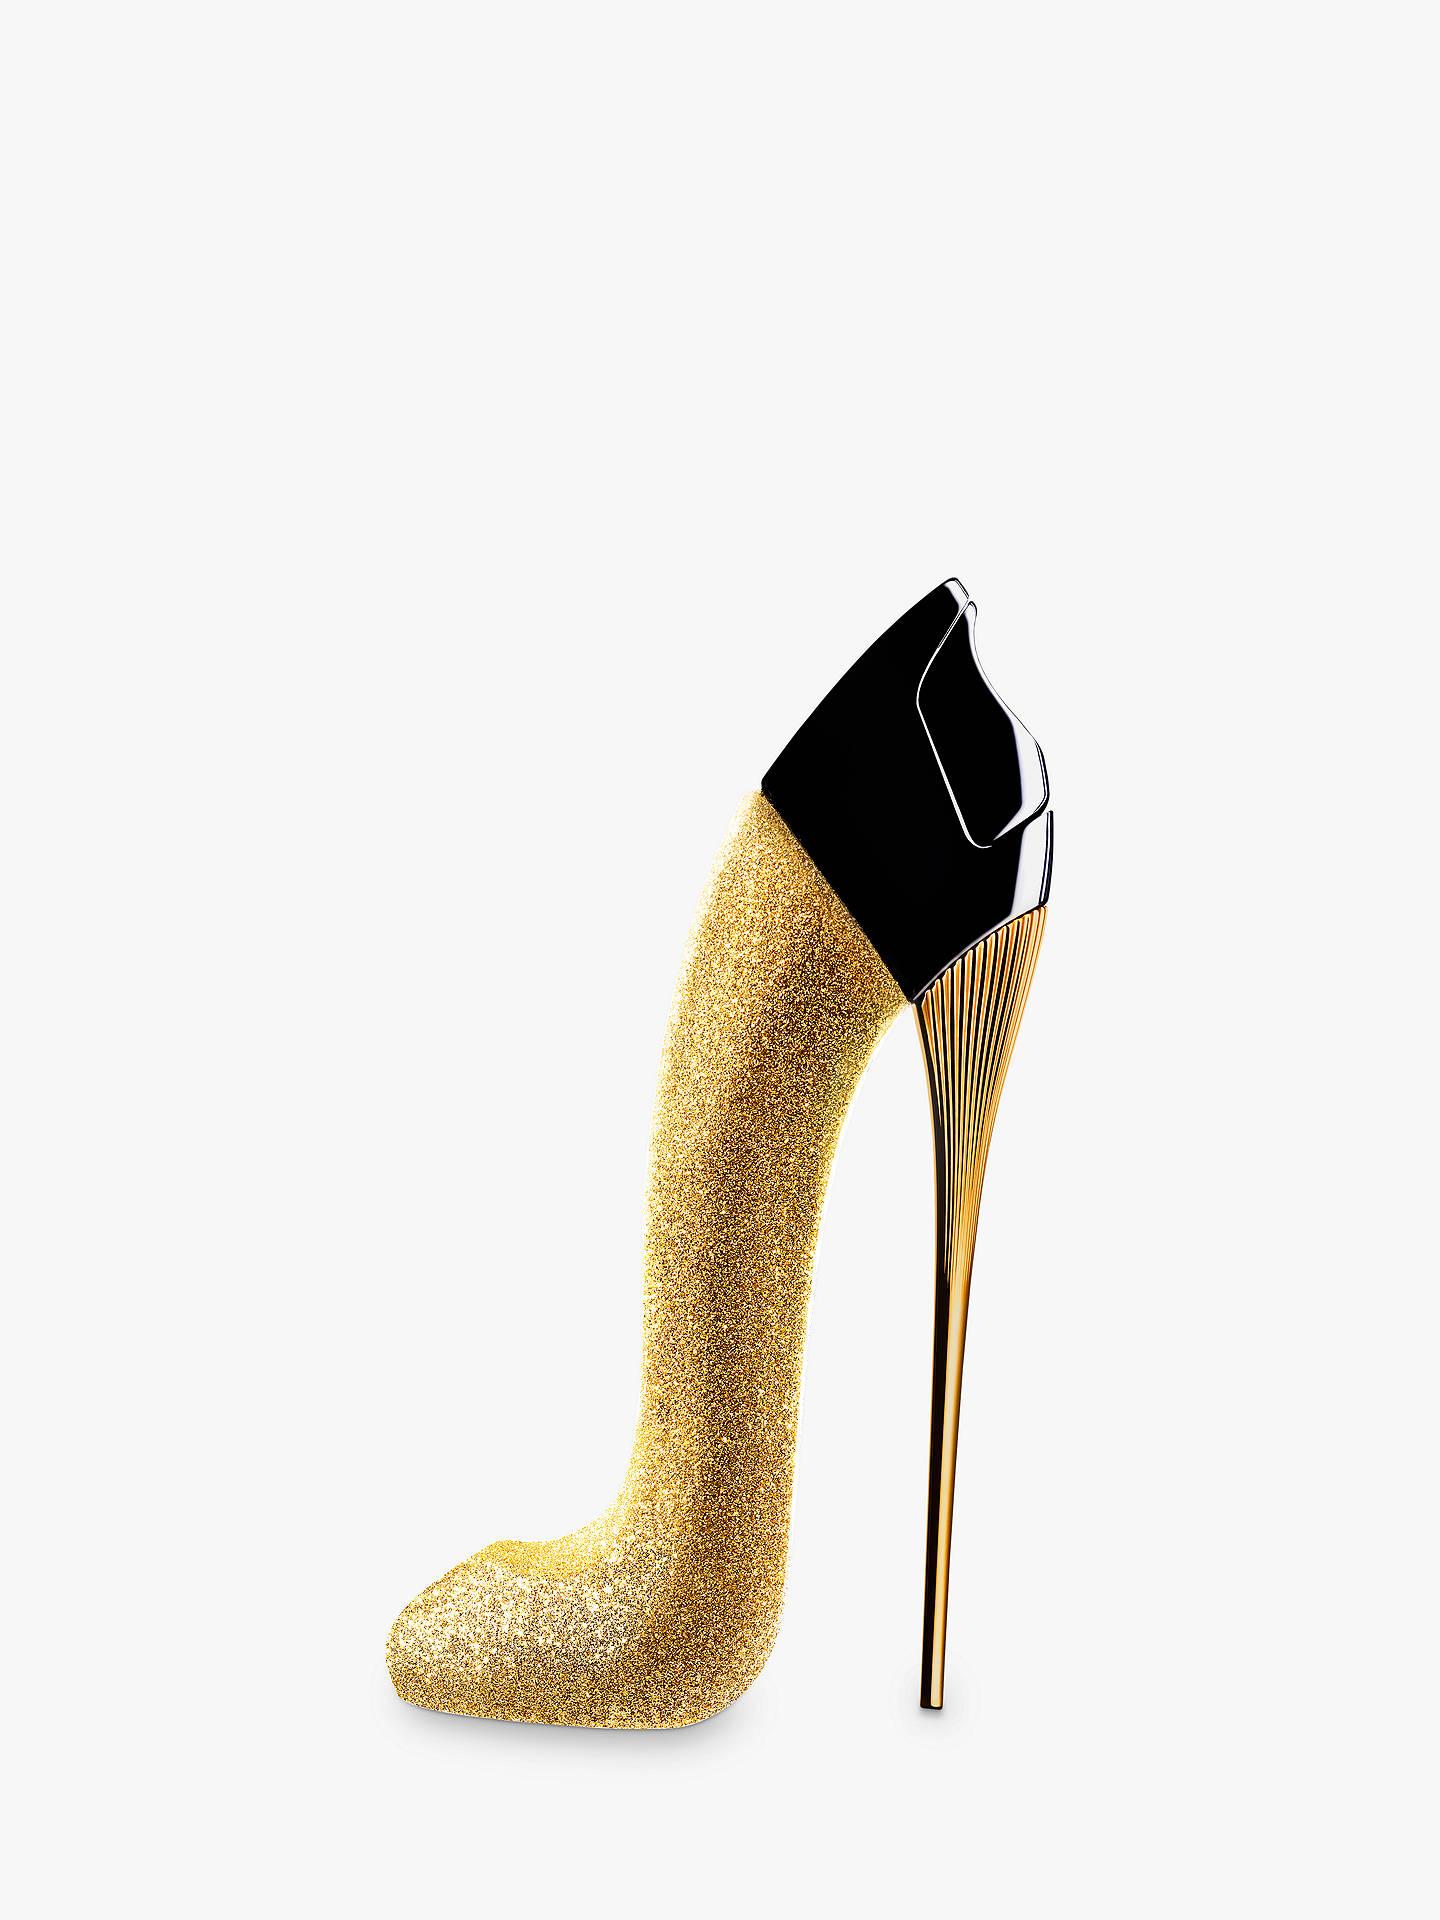 Carolina Herrera Good Girl Glorious Gold Collector Edition Eau De Parfum, 80ml by Carolina Herrera